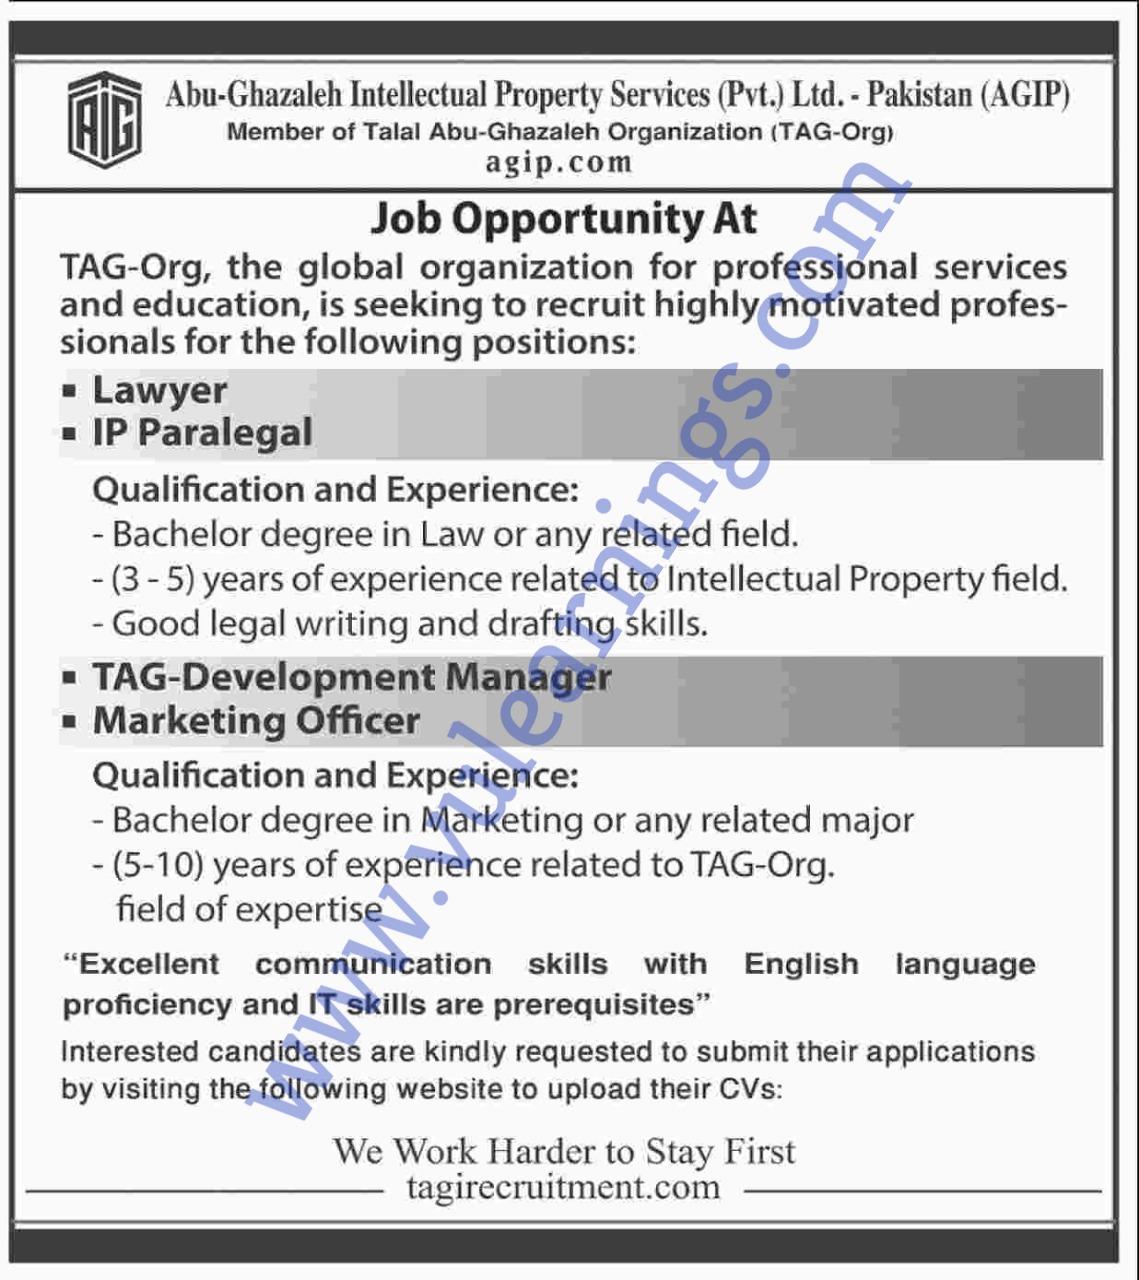 Job in Abu-Ghazaleh Intellectual Property Service